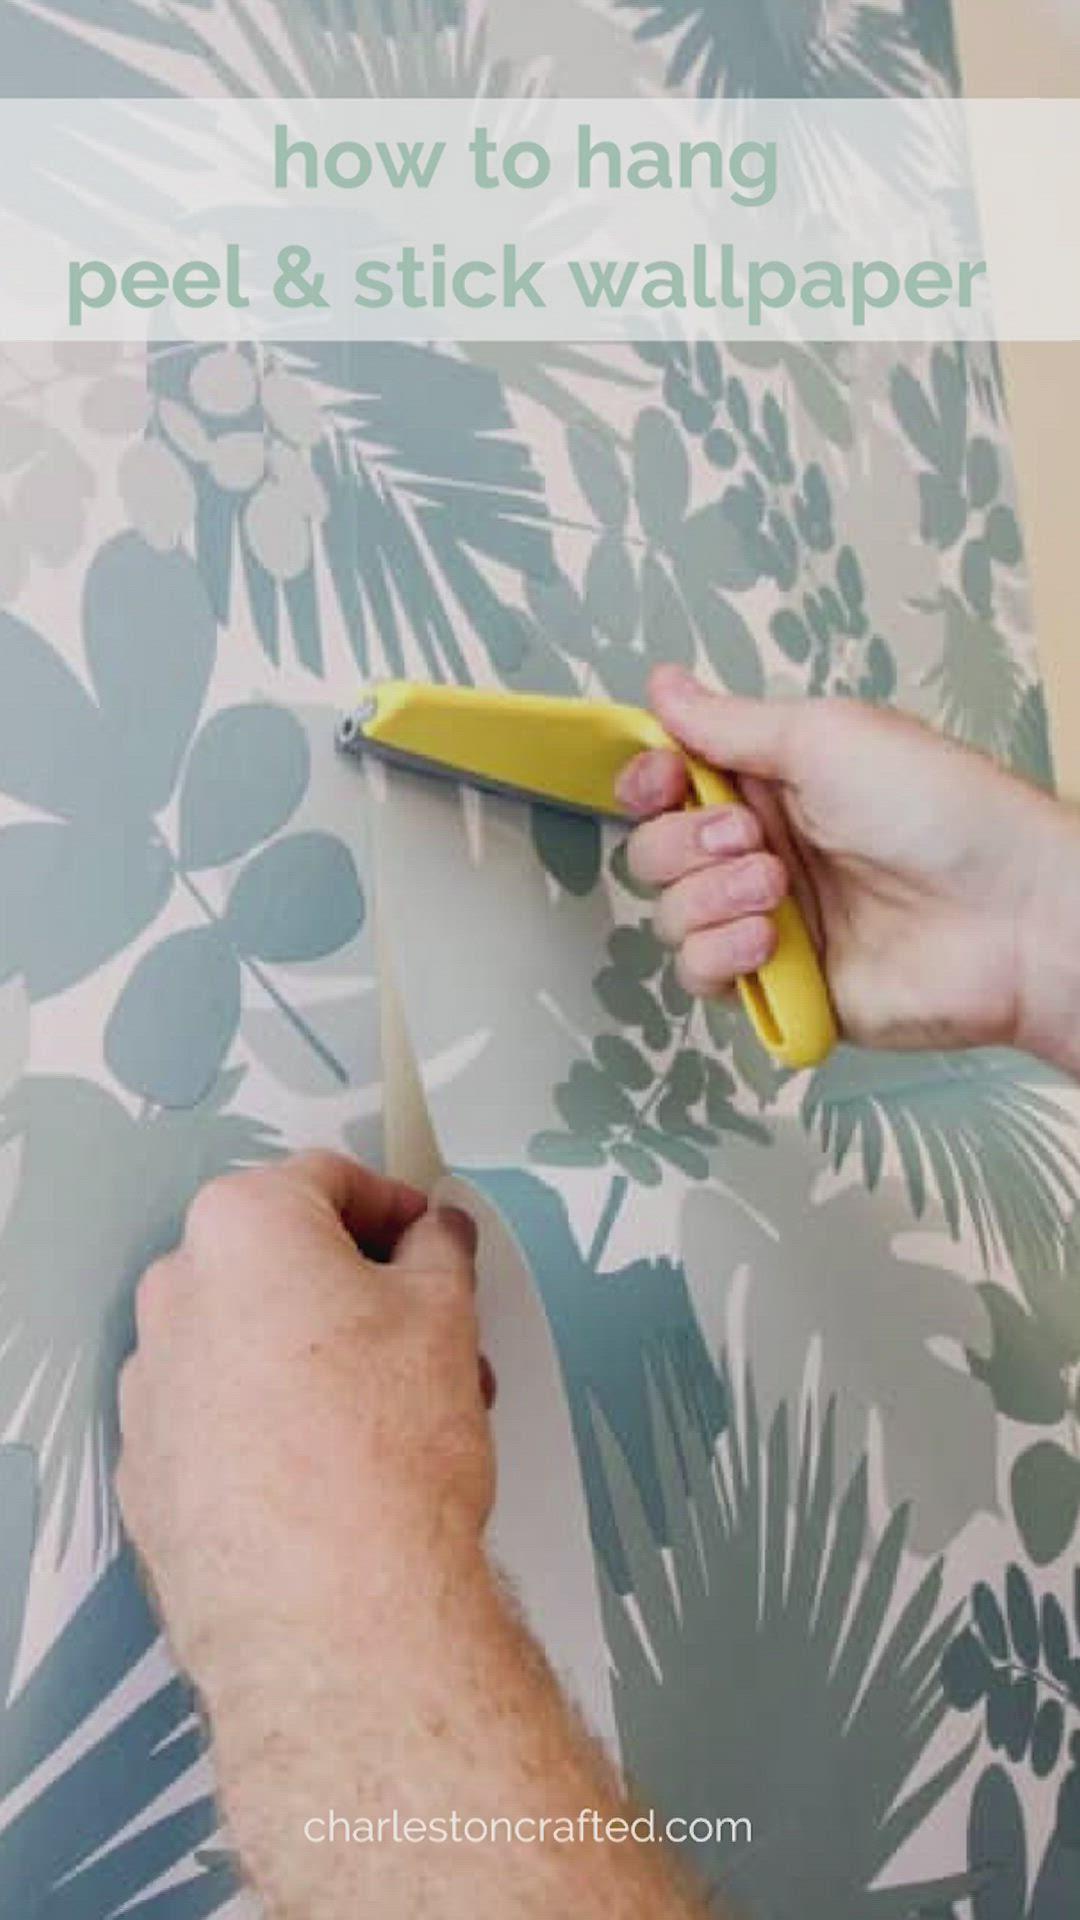 How To Hang Peel Stick Wallpaper Video Video Peel And Stick Wallpaper Stick On Wallpaper Diy Wallpaper